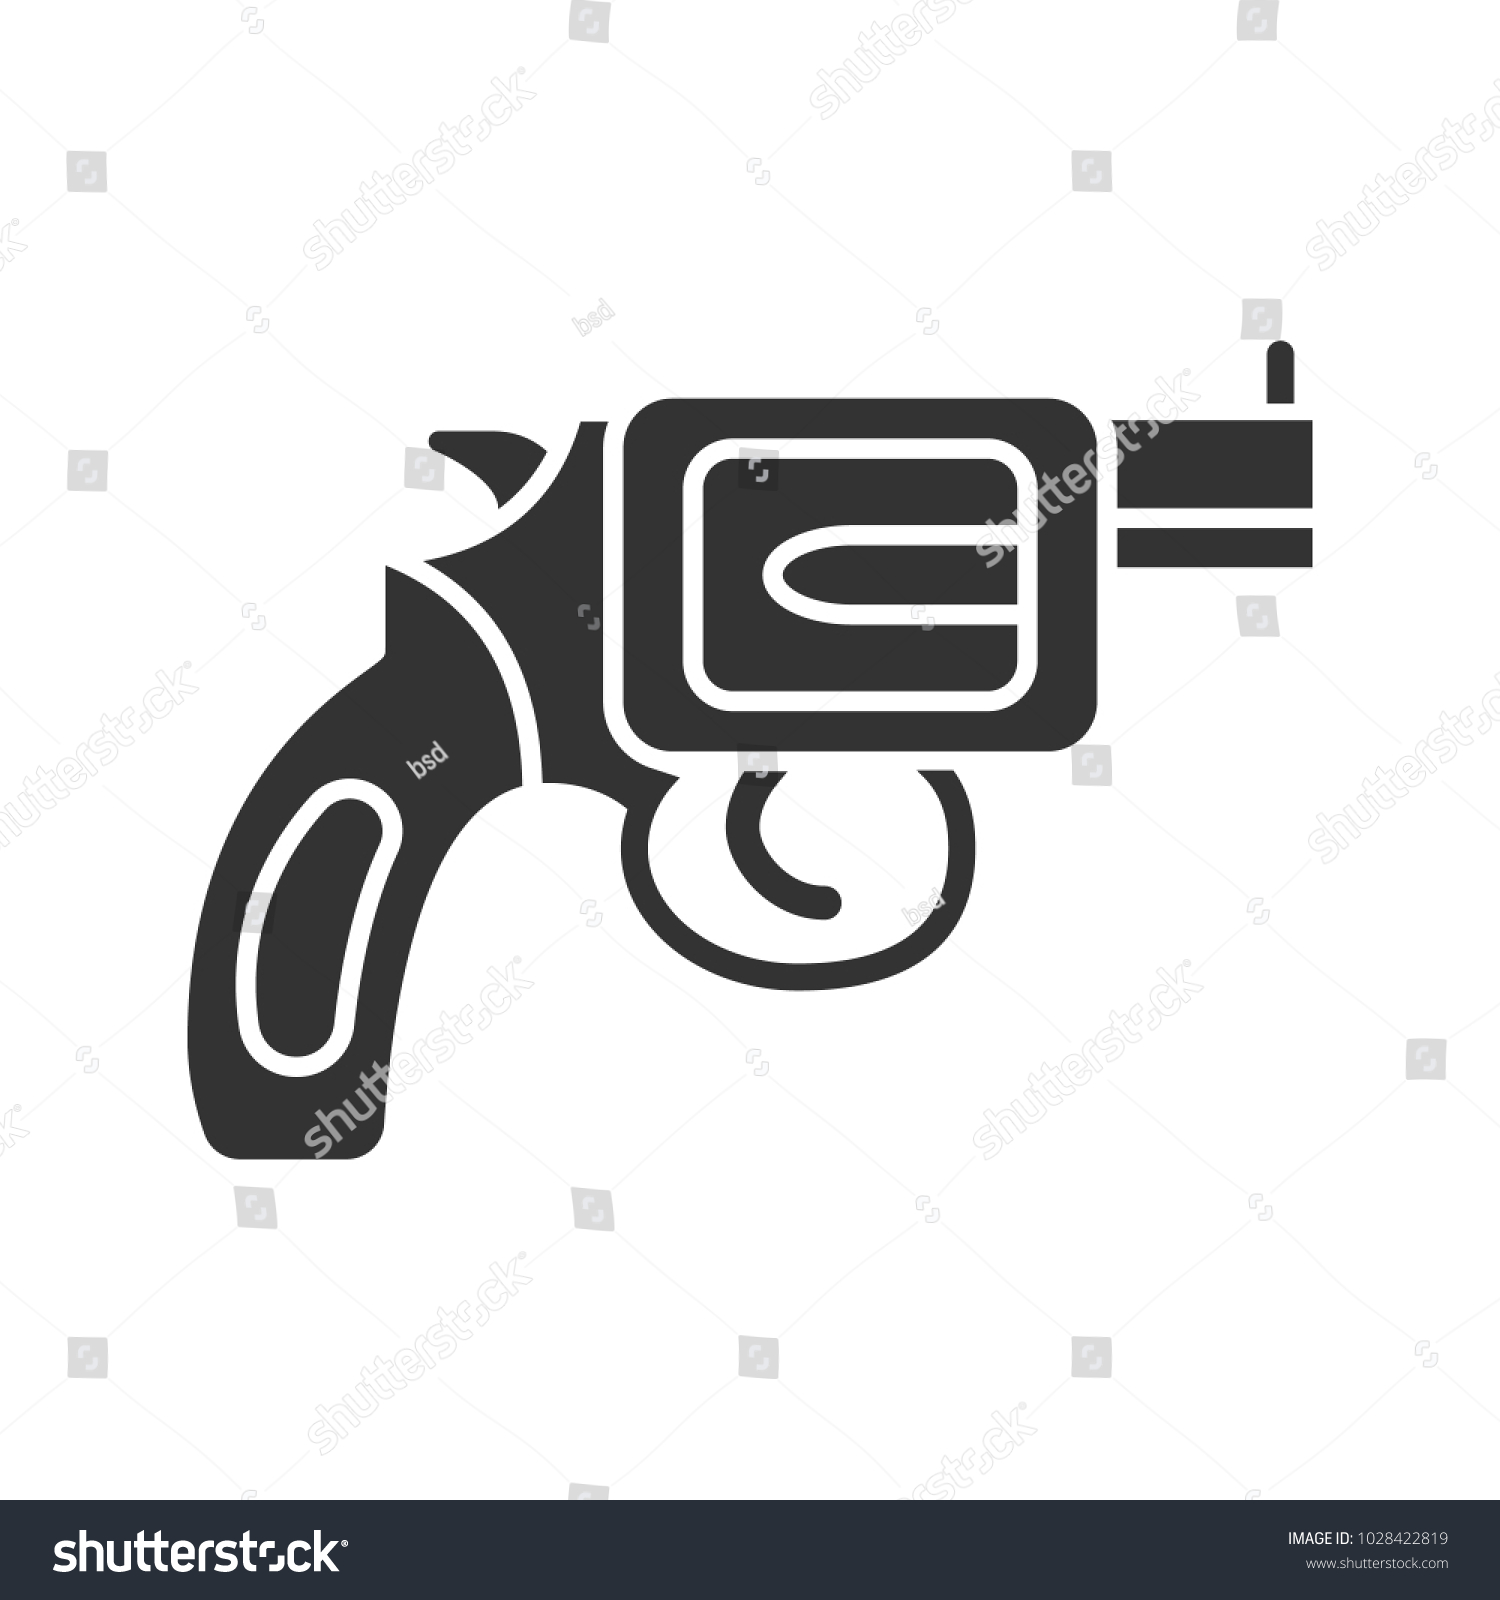 Pistol text symbol gallery symbol and sign ideas pistol text symbol choice image symbol and sign ideas revolver glyph icon pistol gun silhouette stock buycottarizona